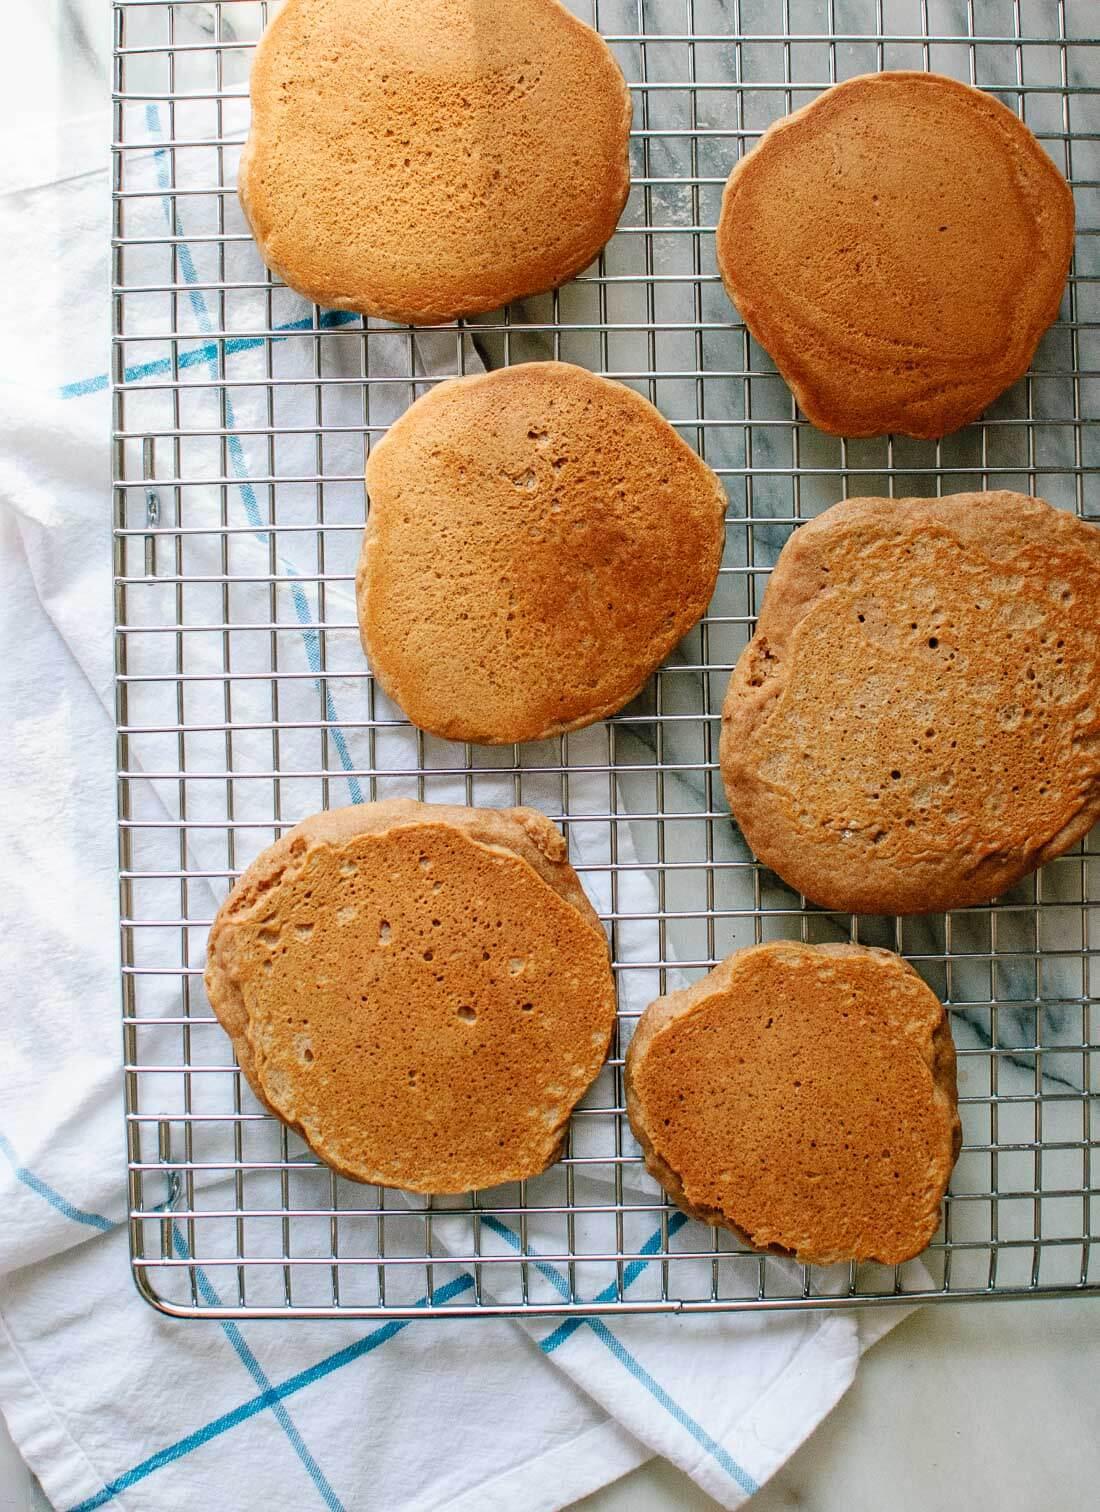 Easy pan cake recipes